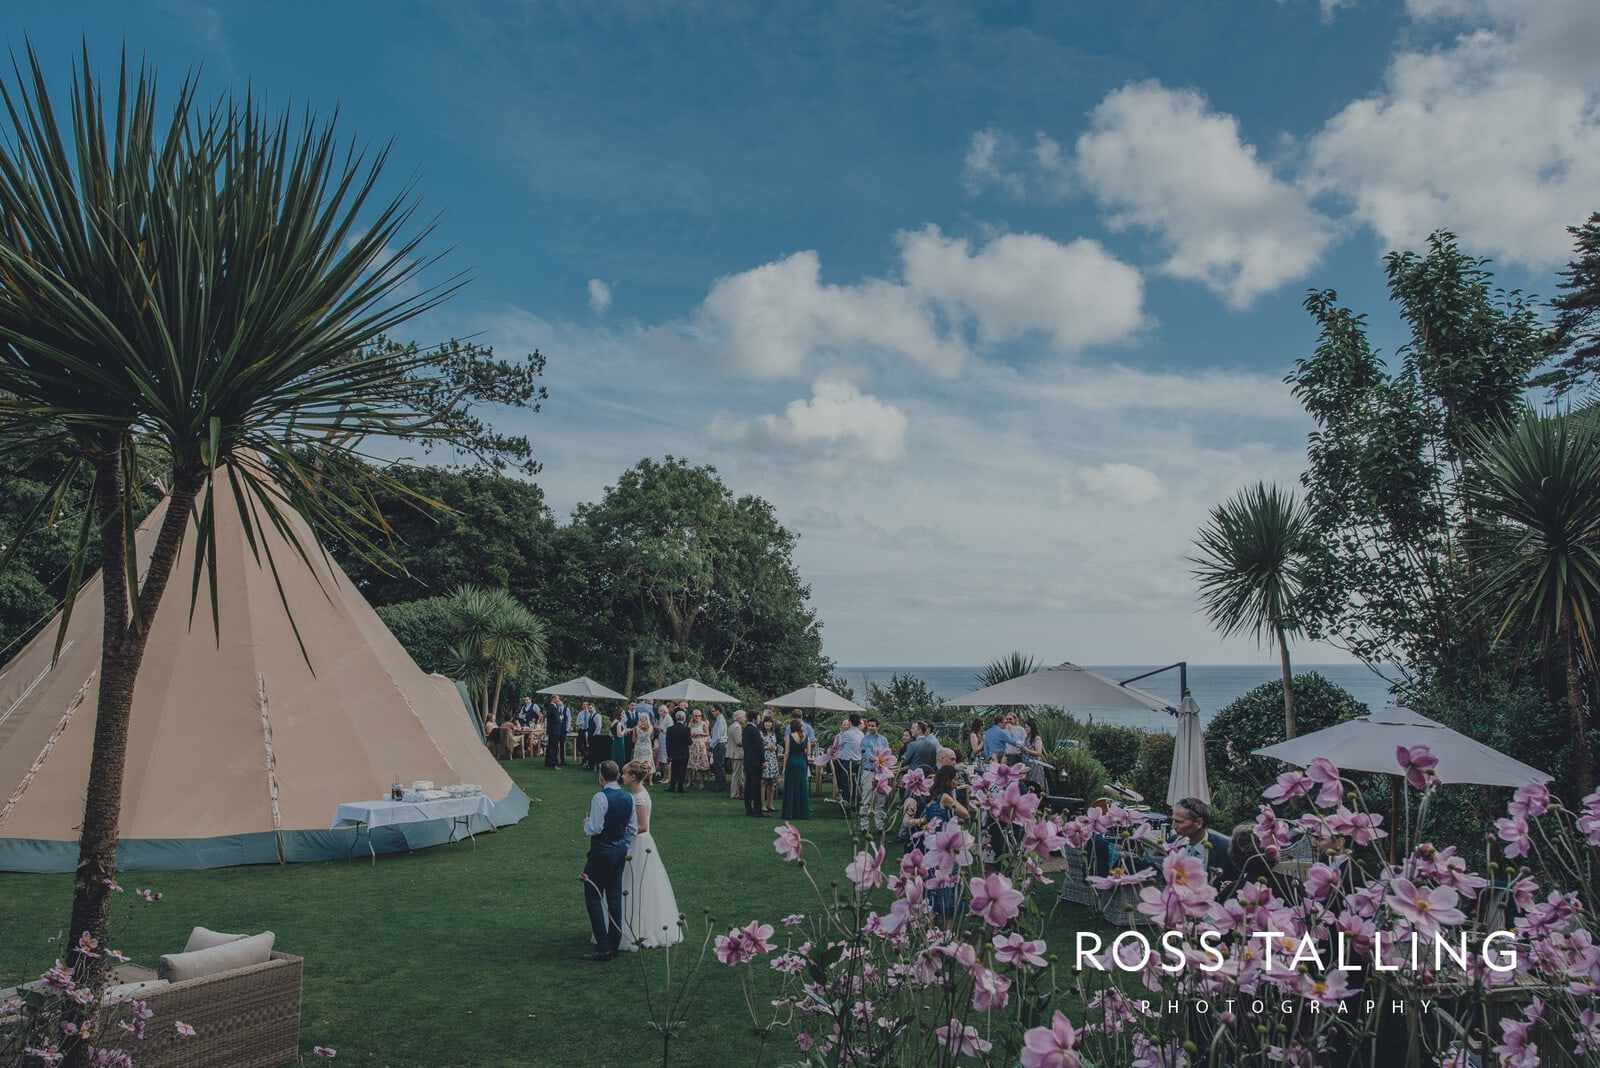 laura-matts-rosevine-hotel-wedding-photography-cornwall_0118